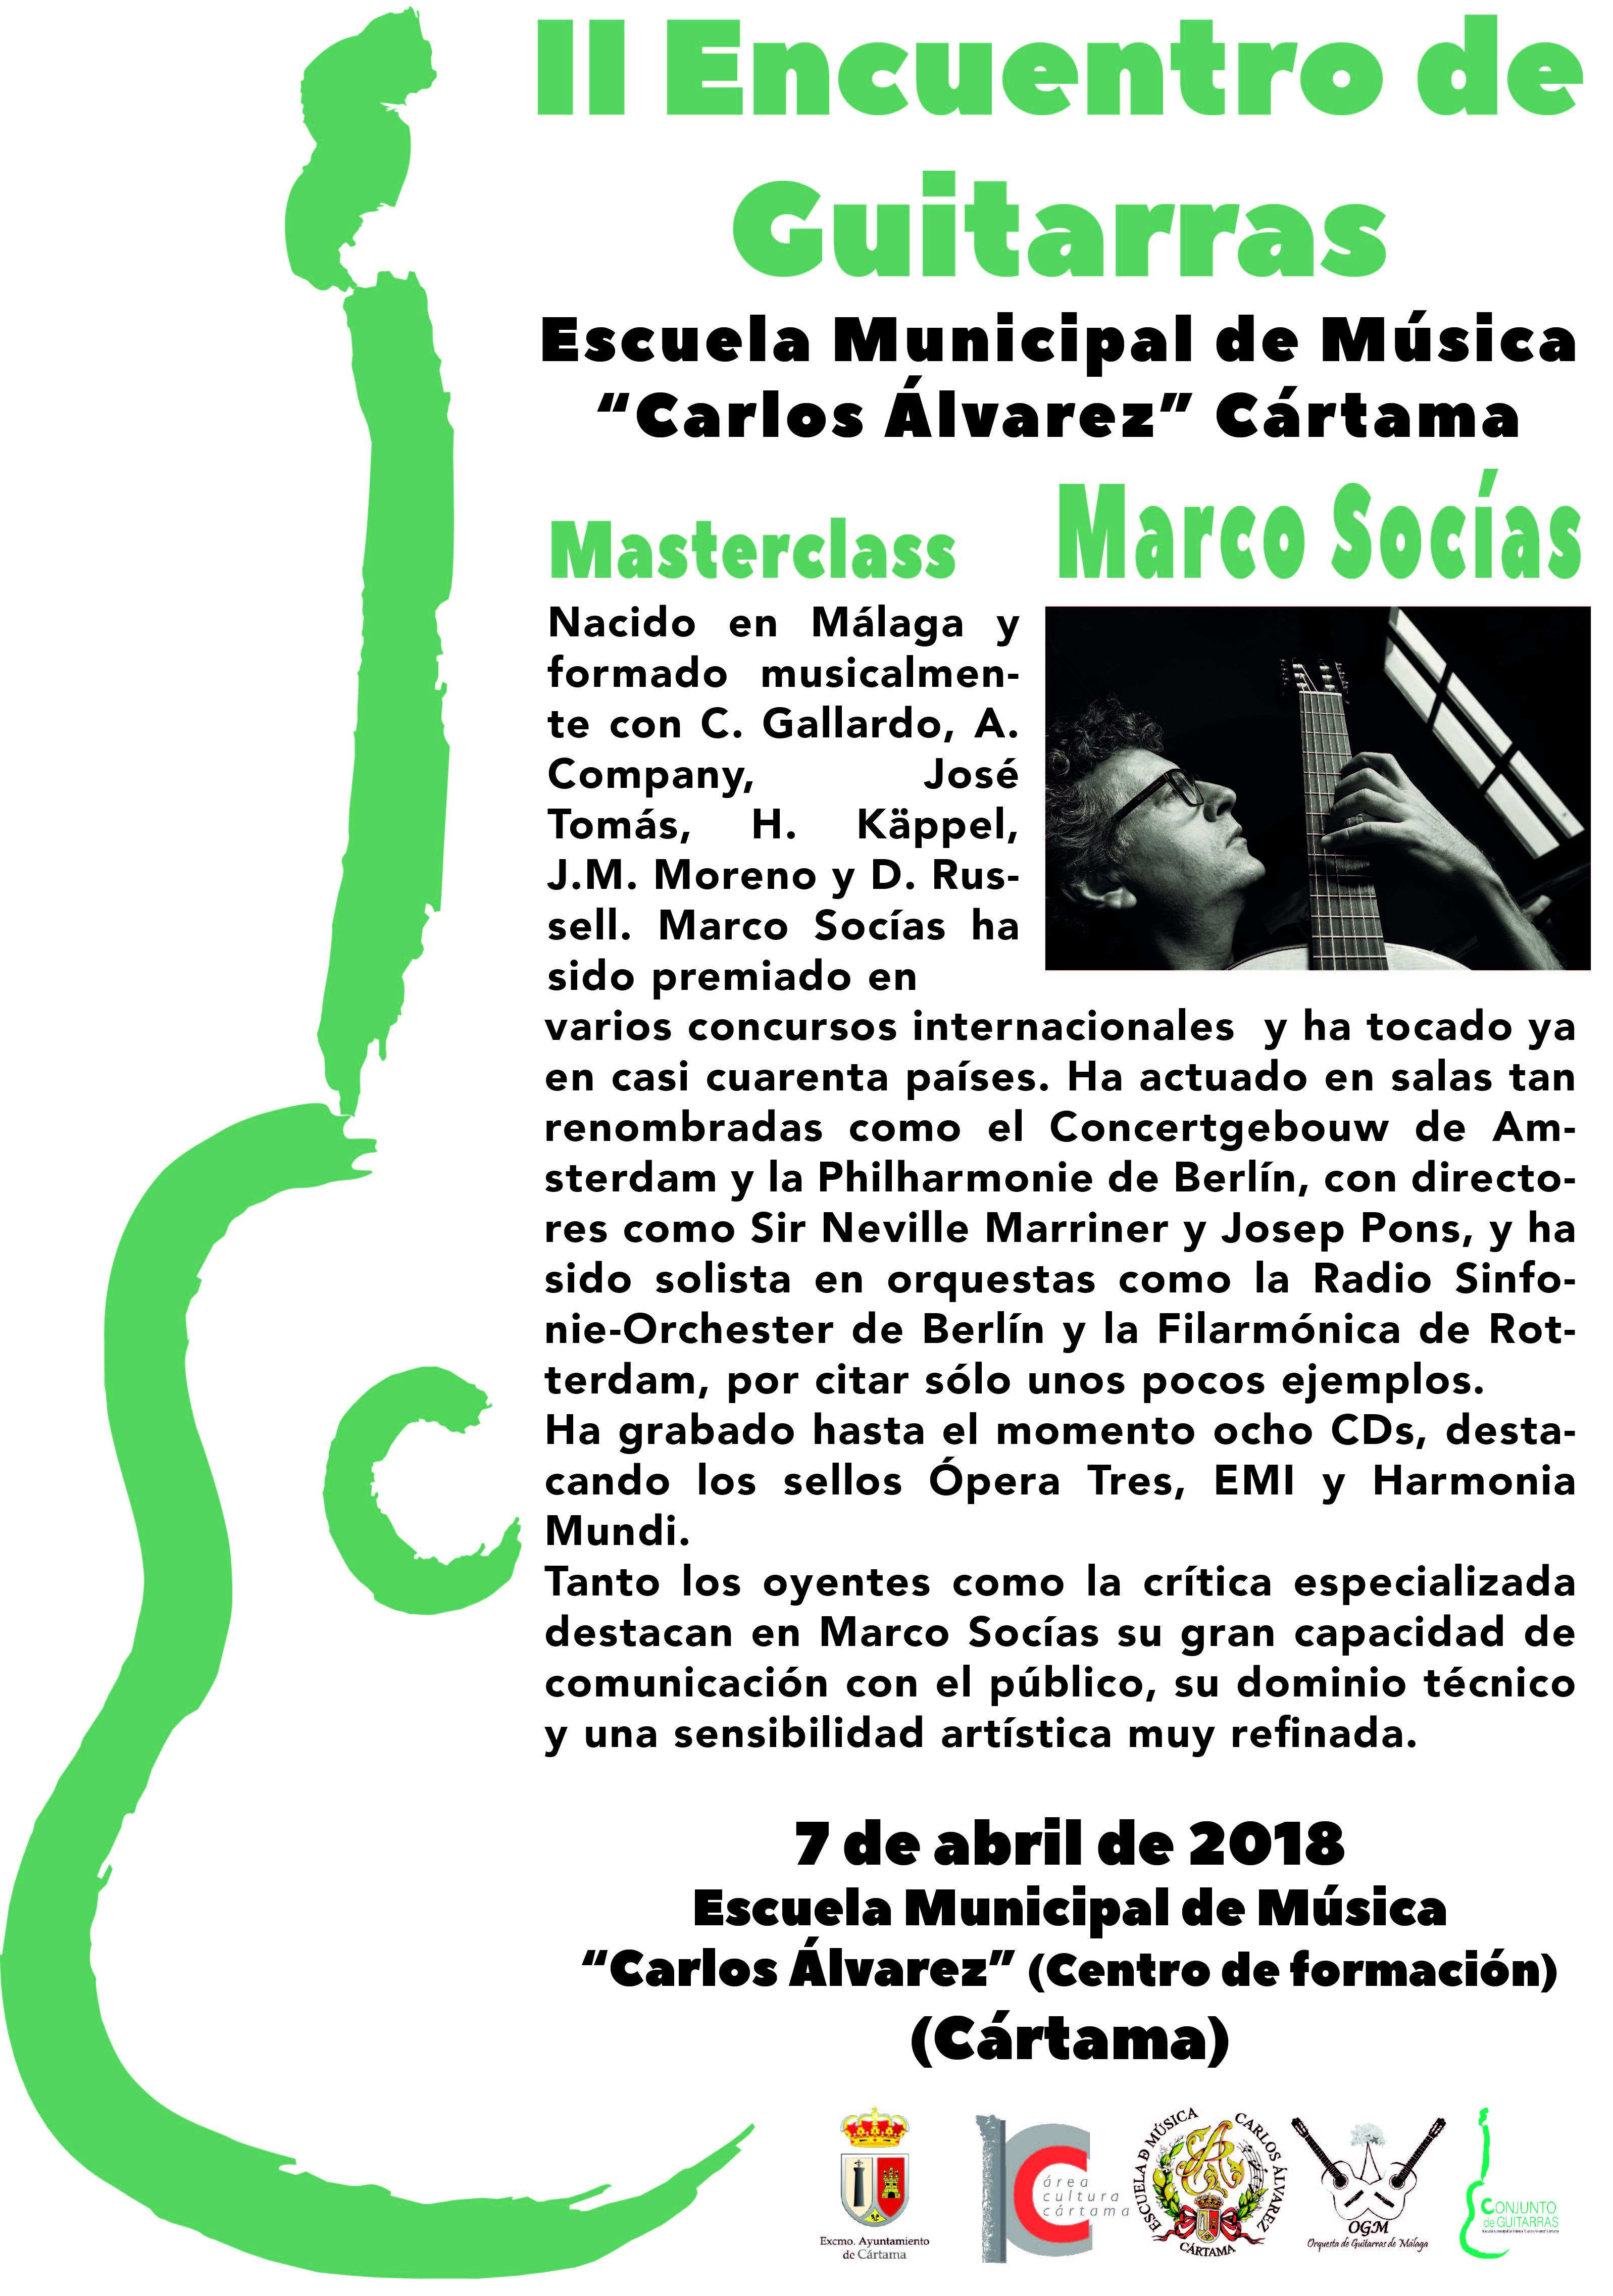 cartel Encuentro Guitarras info Marco Socias